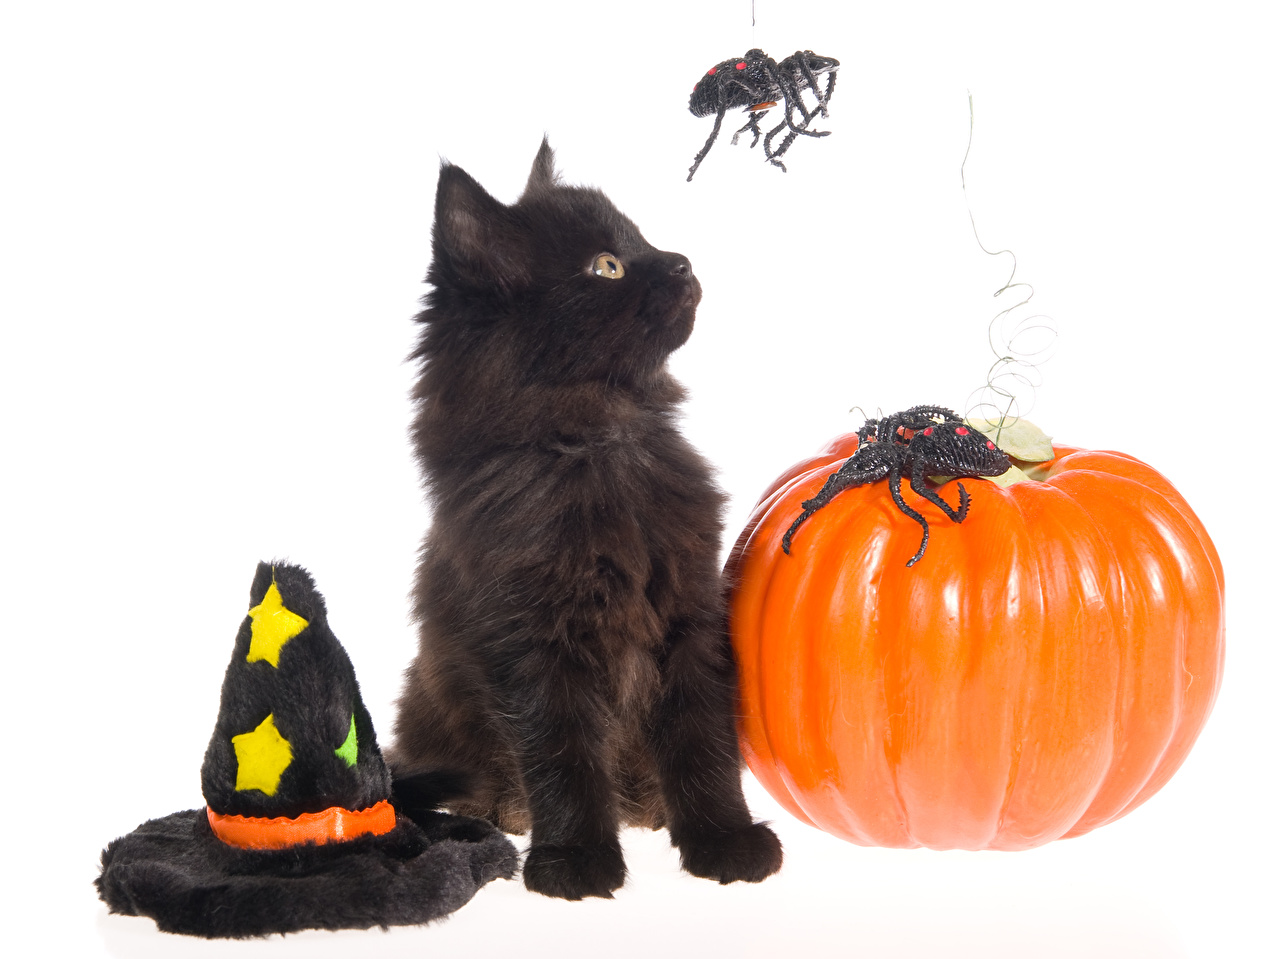 Картинки Котята Коты Пауки Шляпа Тыква Хеллоуин Животные Белый фон Праздники Кошки